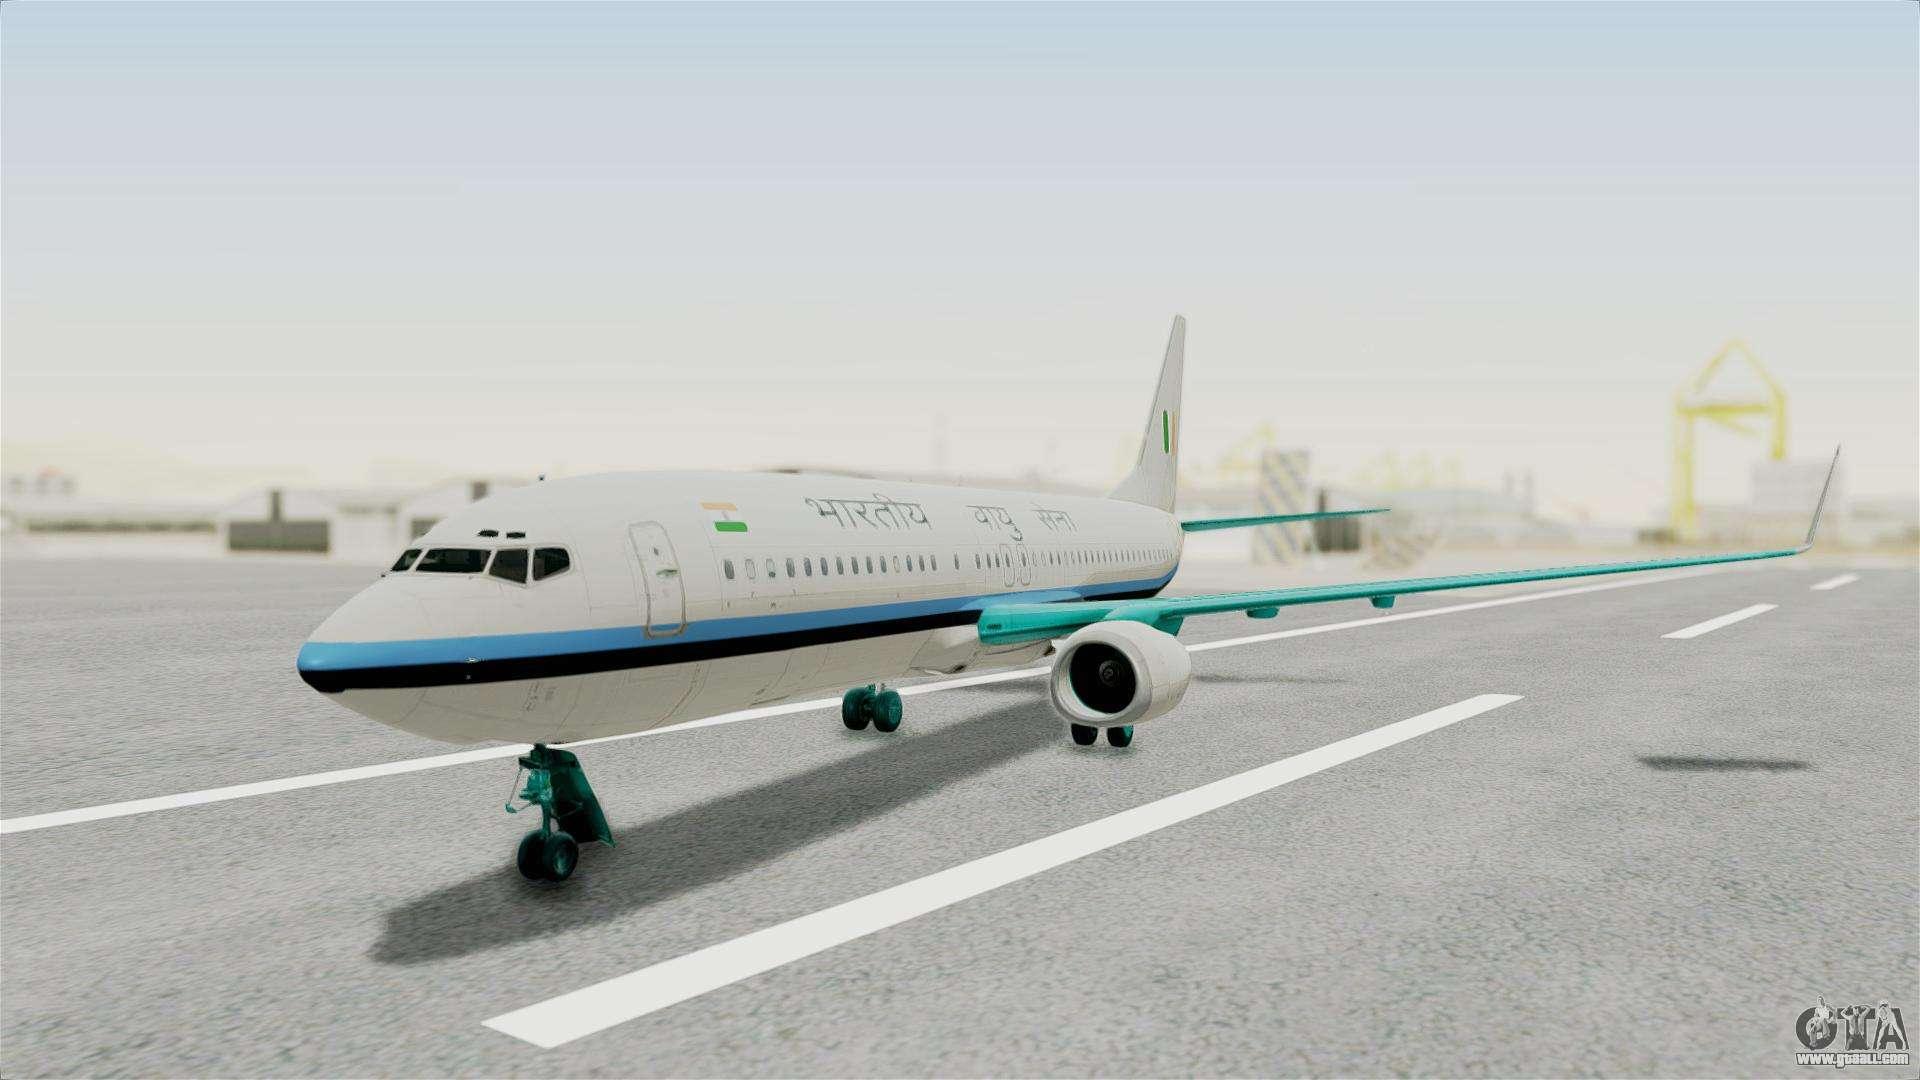 boeing 737 aircraft aviation - photo #19